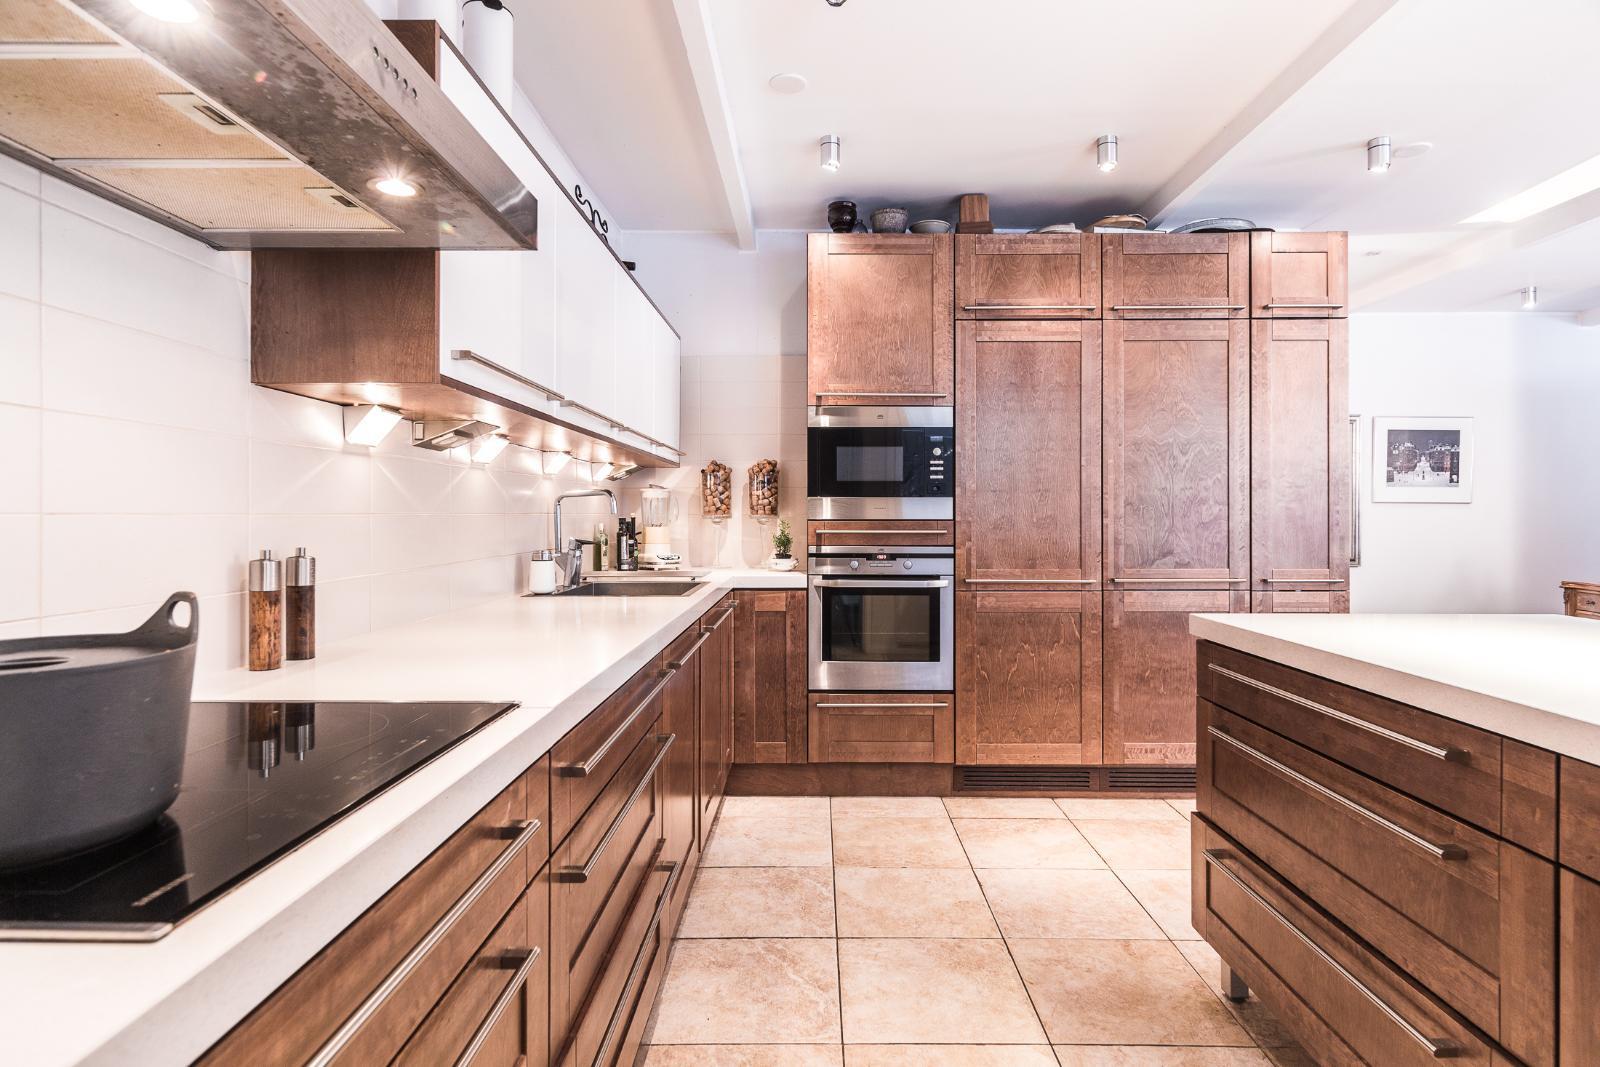 Moderni keittiö 9691256  Etuovi com Ideat & vinkit